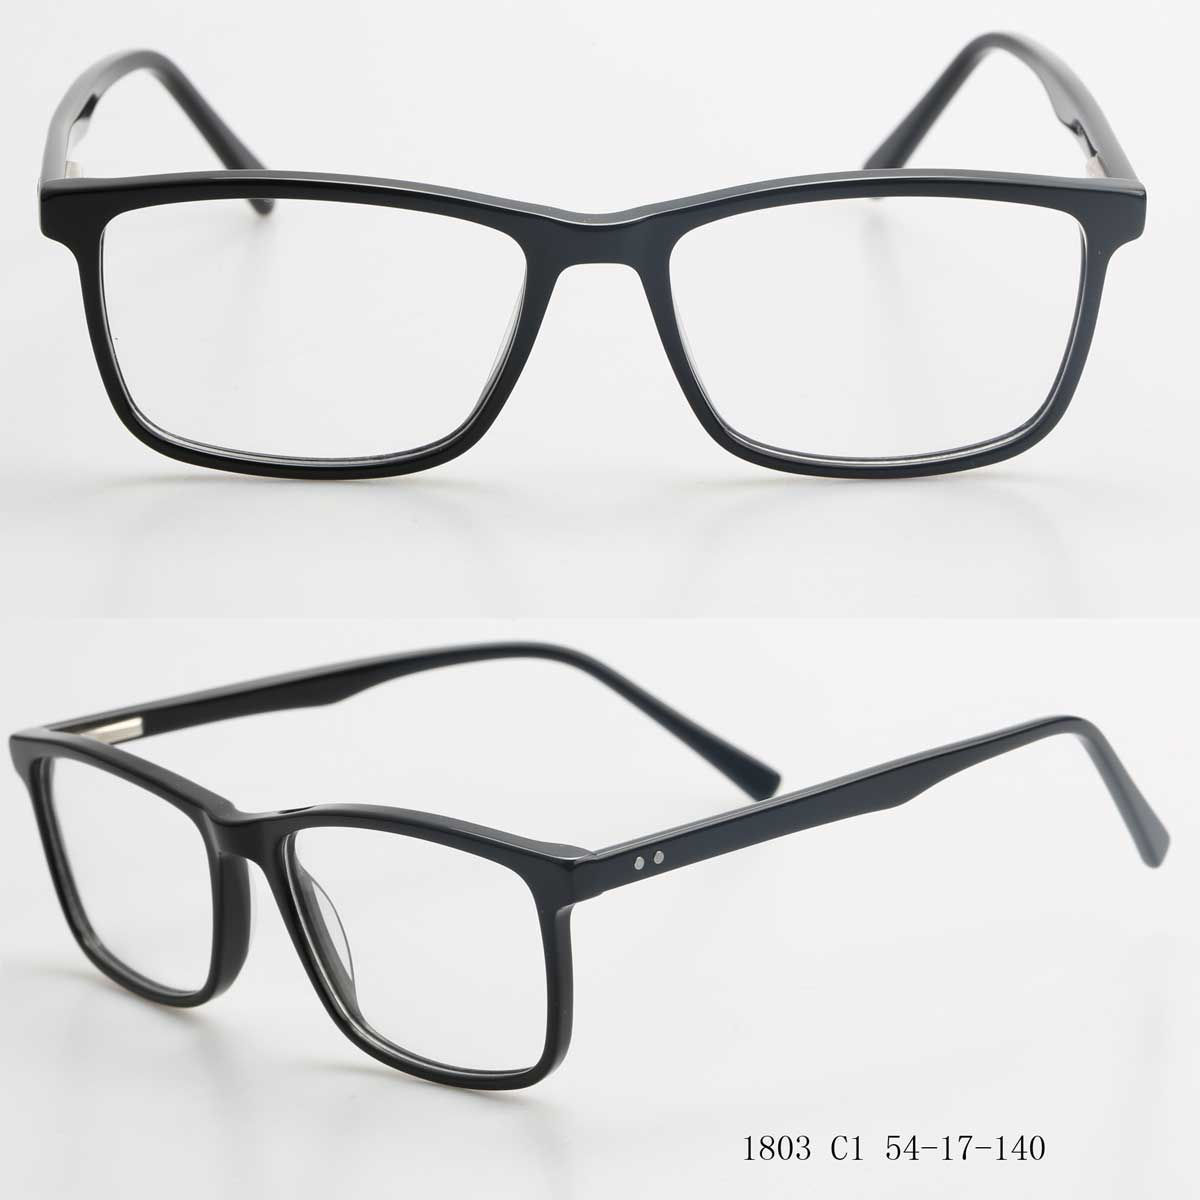 04f619fe06 New born unisex Acetate Frames Optical eyewear Ready Glasses frames stocks prescription  eyeglasses